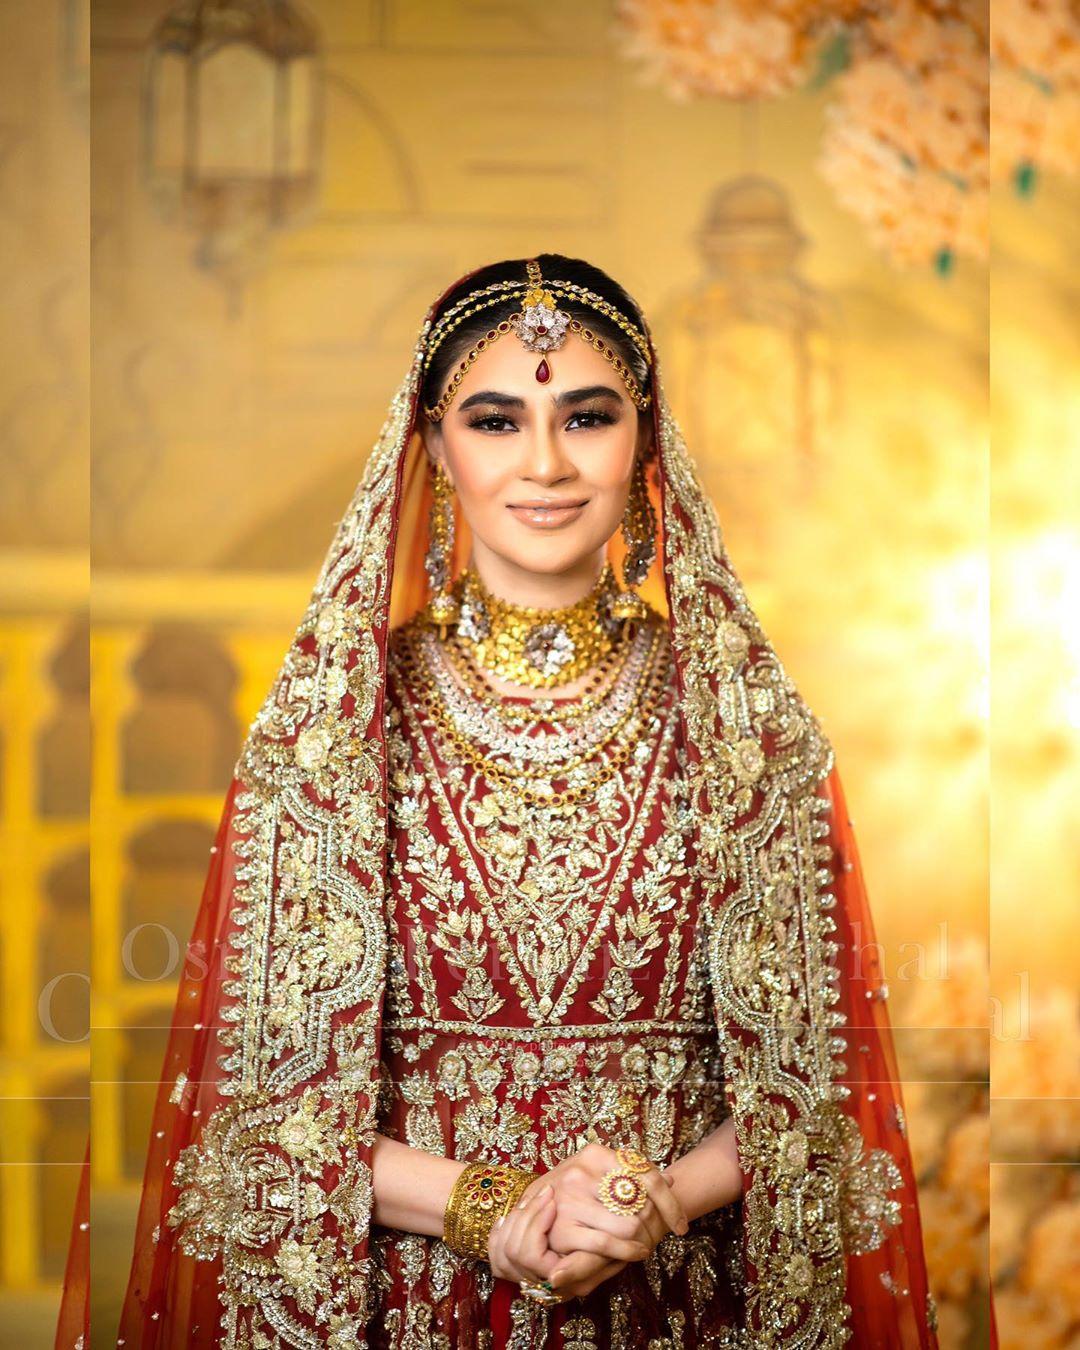 Saheefa Jabbar Khattak Beautiful Bridal Makeover Photo Shoot for Hina Shah